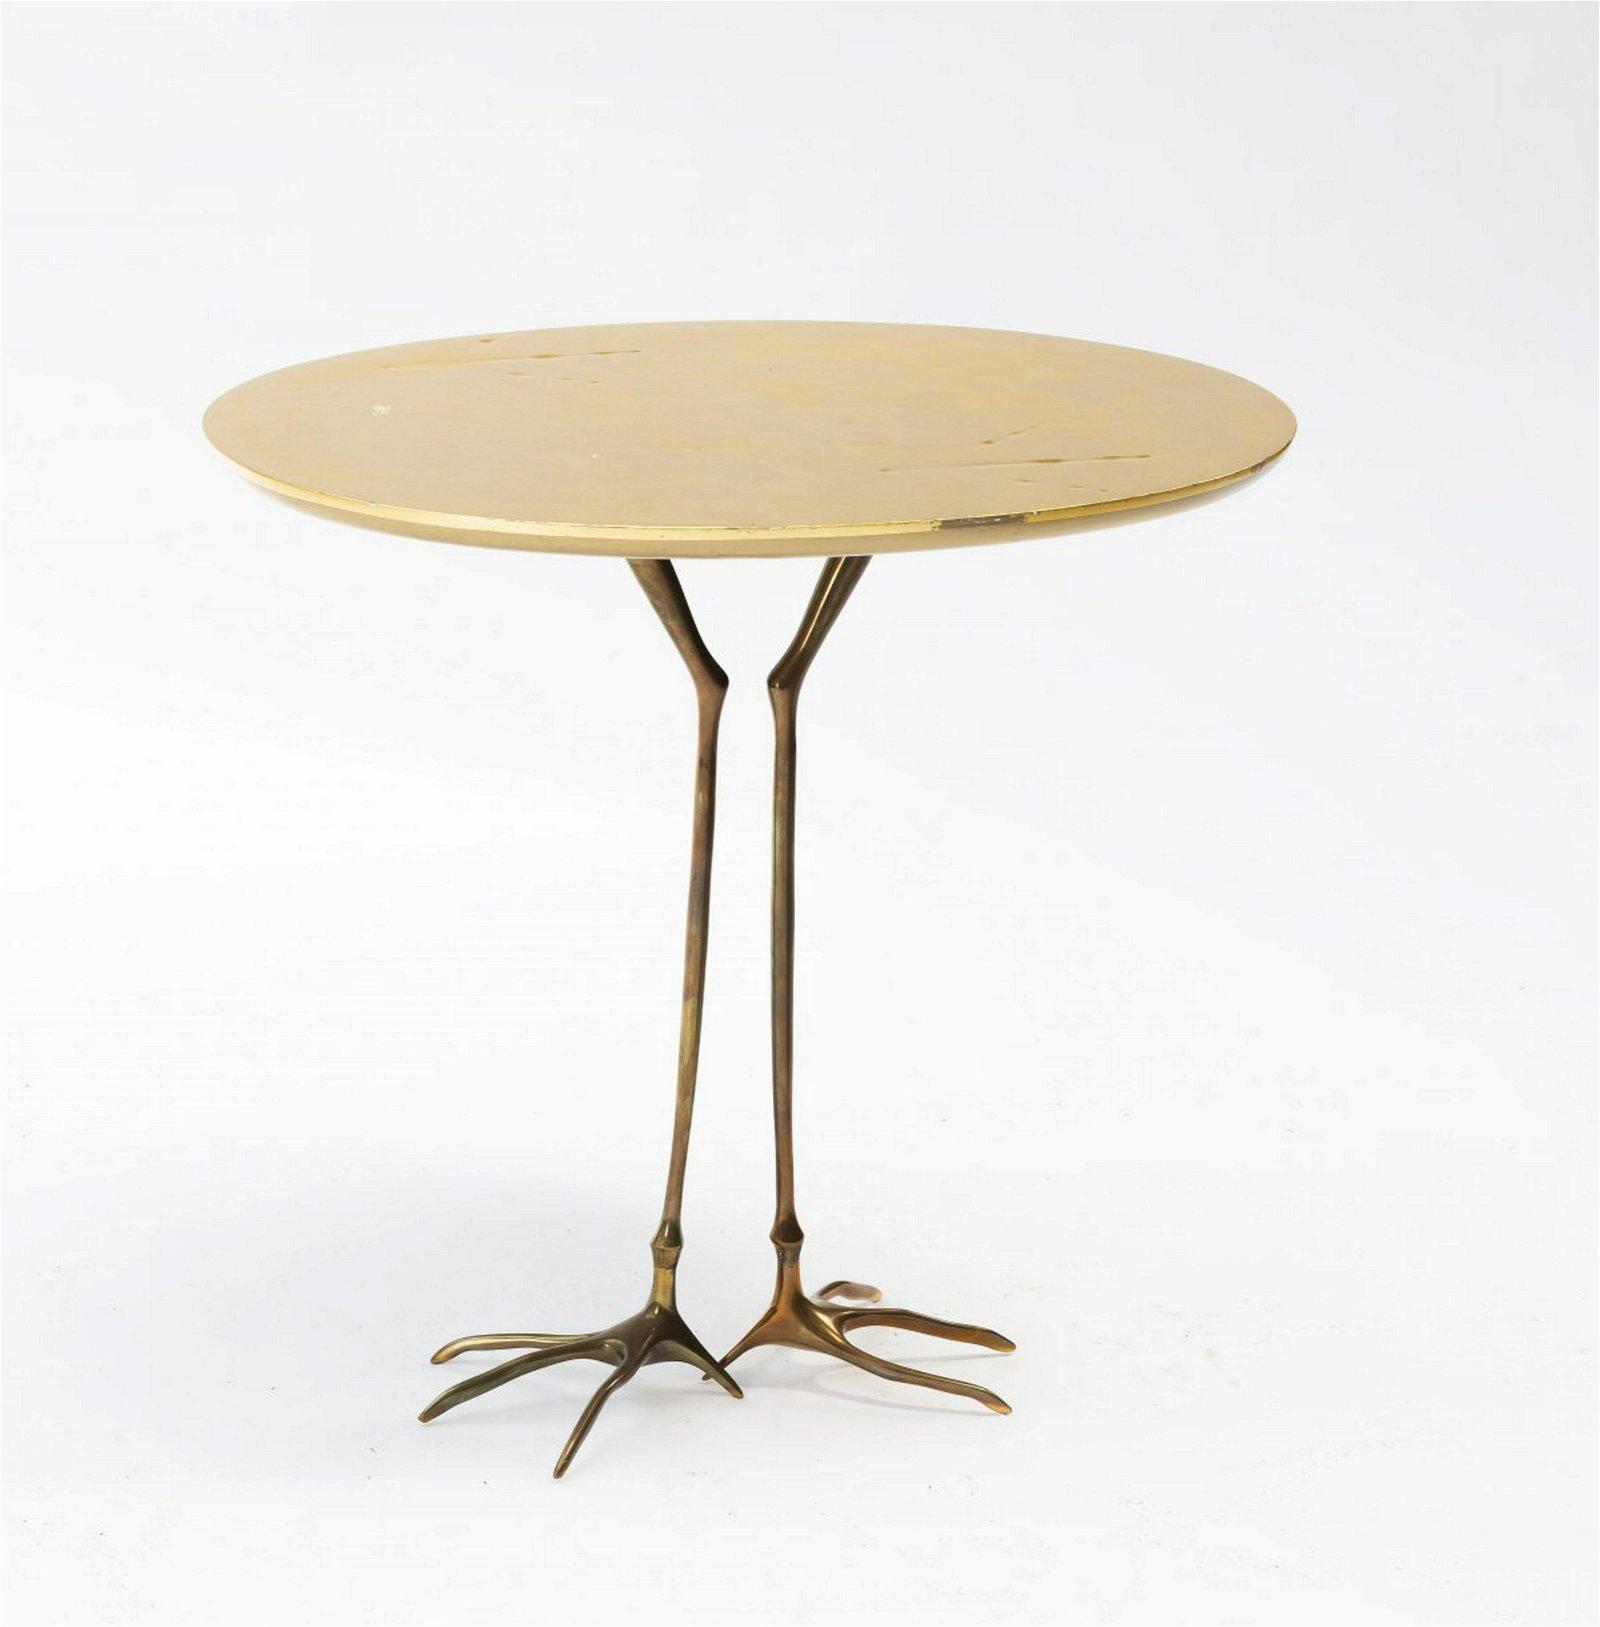 Meret Oppenheim, 'Traccia' side tabel, 1971